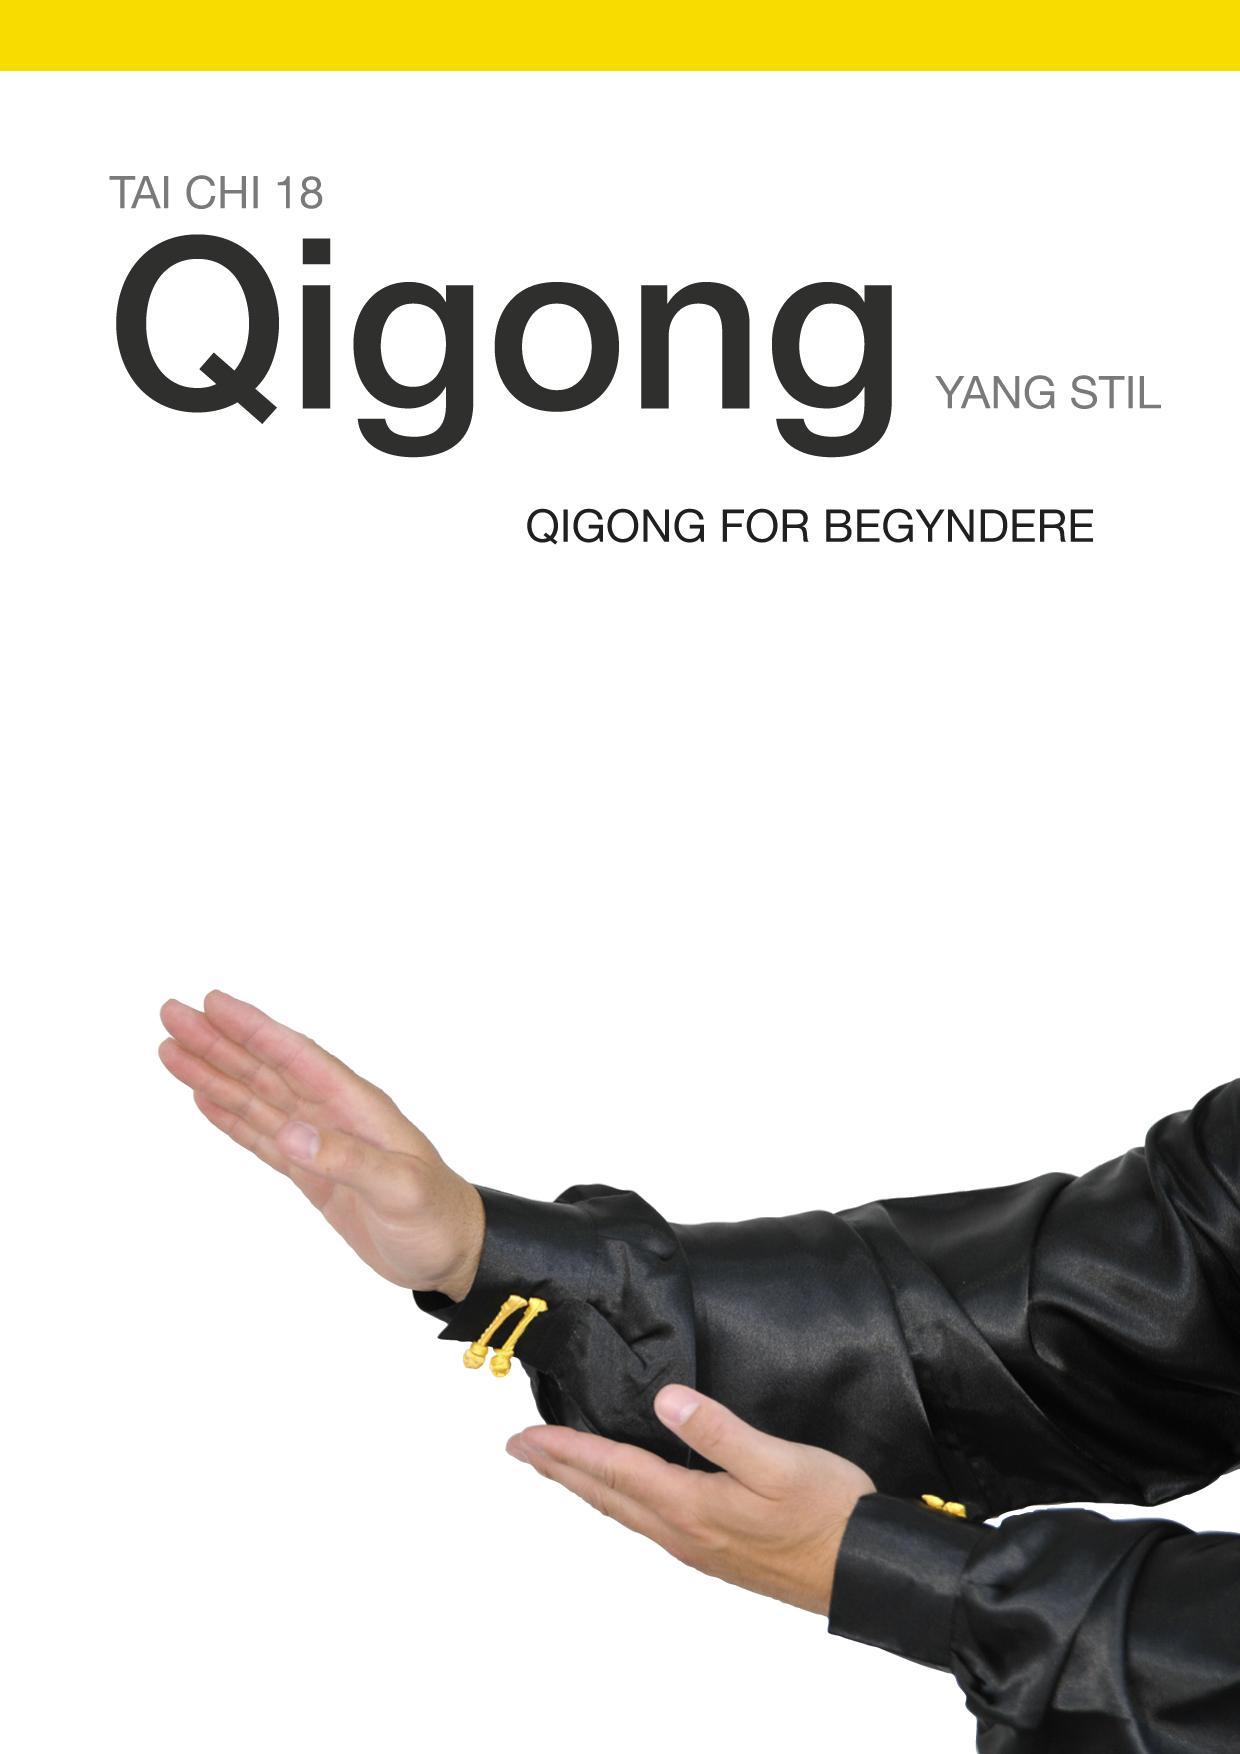 N/A Tai chi 18: qigong for begyndere - yang stil (e-pub) fra mindly.dk